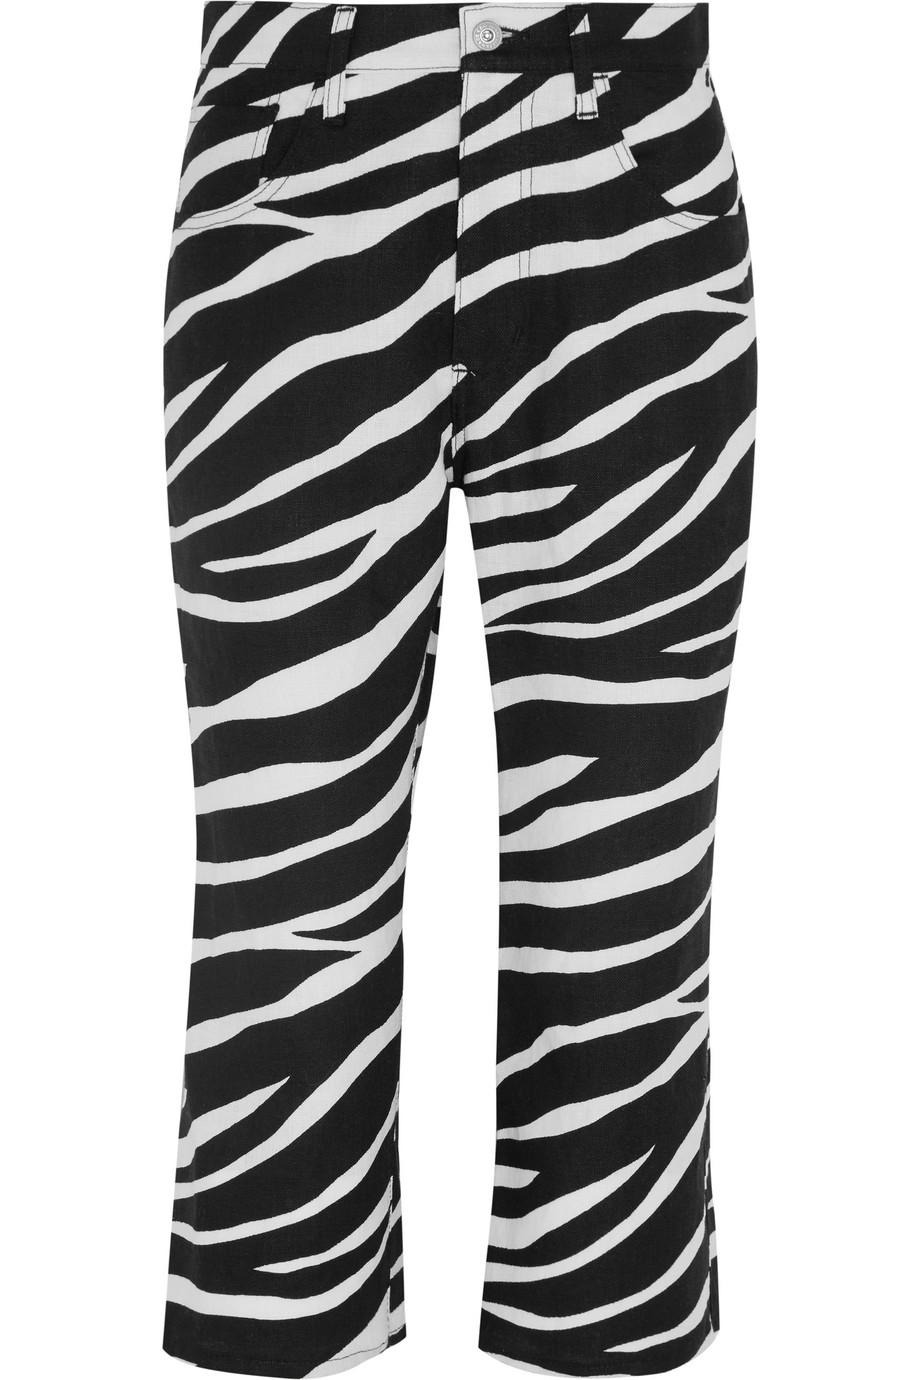 Junya Watanabe Cropped Zebra-Print Linen Flared Pants, Black/Zebra Print, Women's, Size: XS